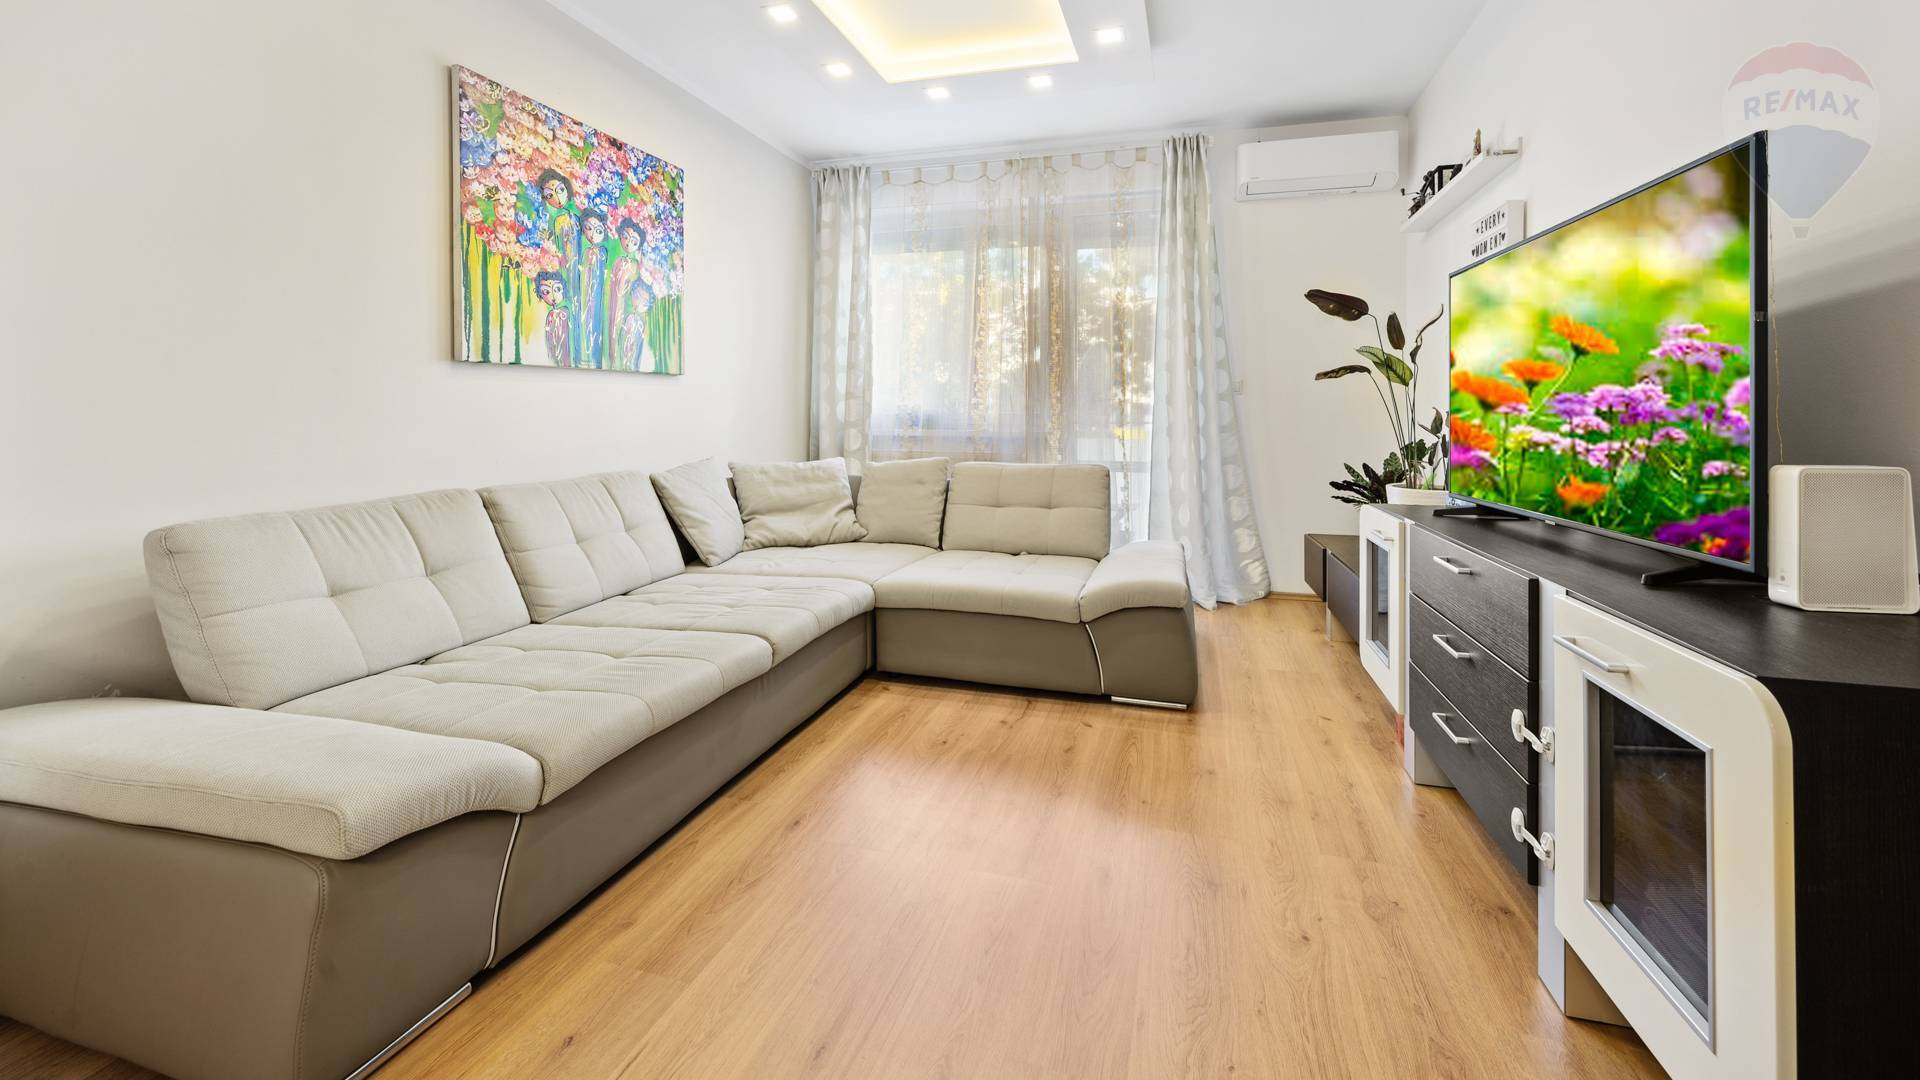 4 izbová NOVOSTAVBA v Prievoze s garážovým státím, Bratislave